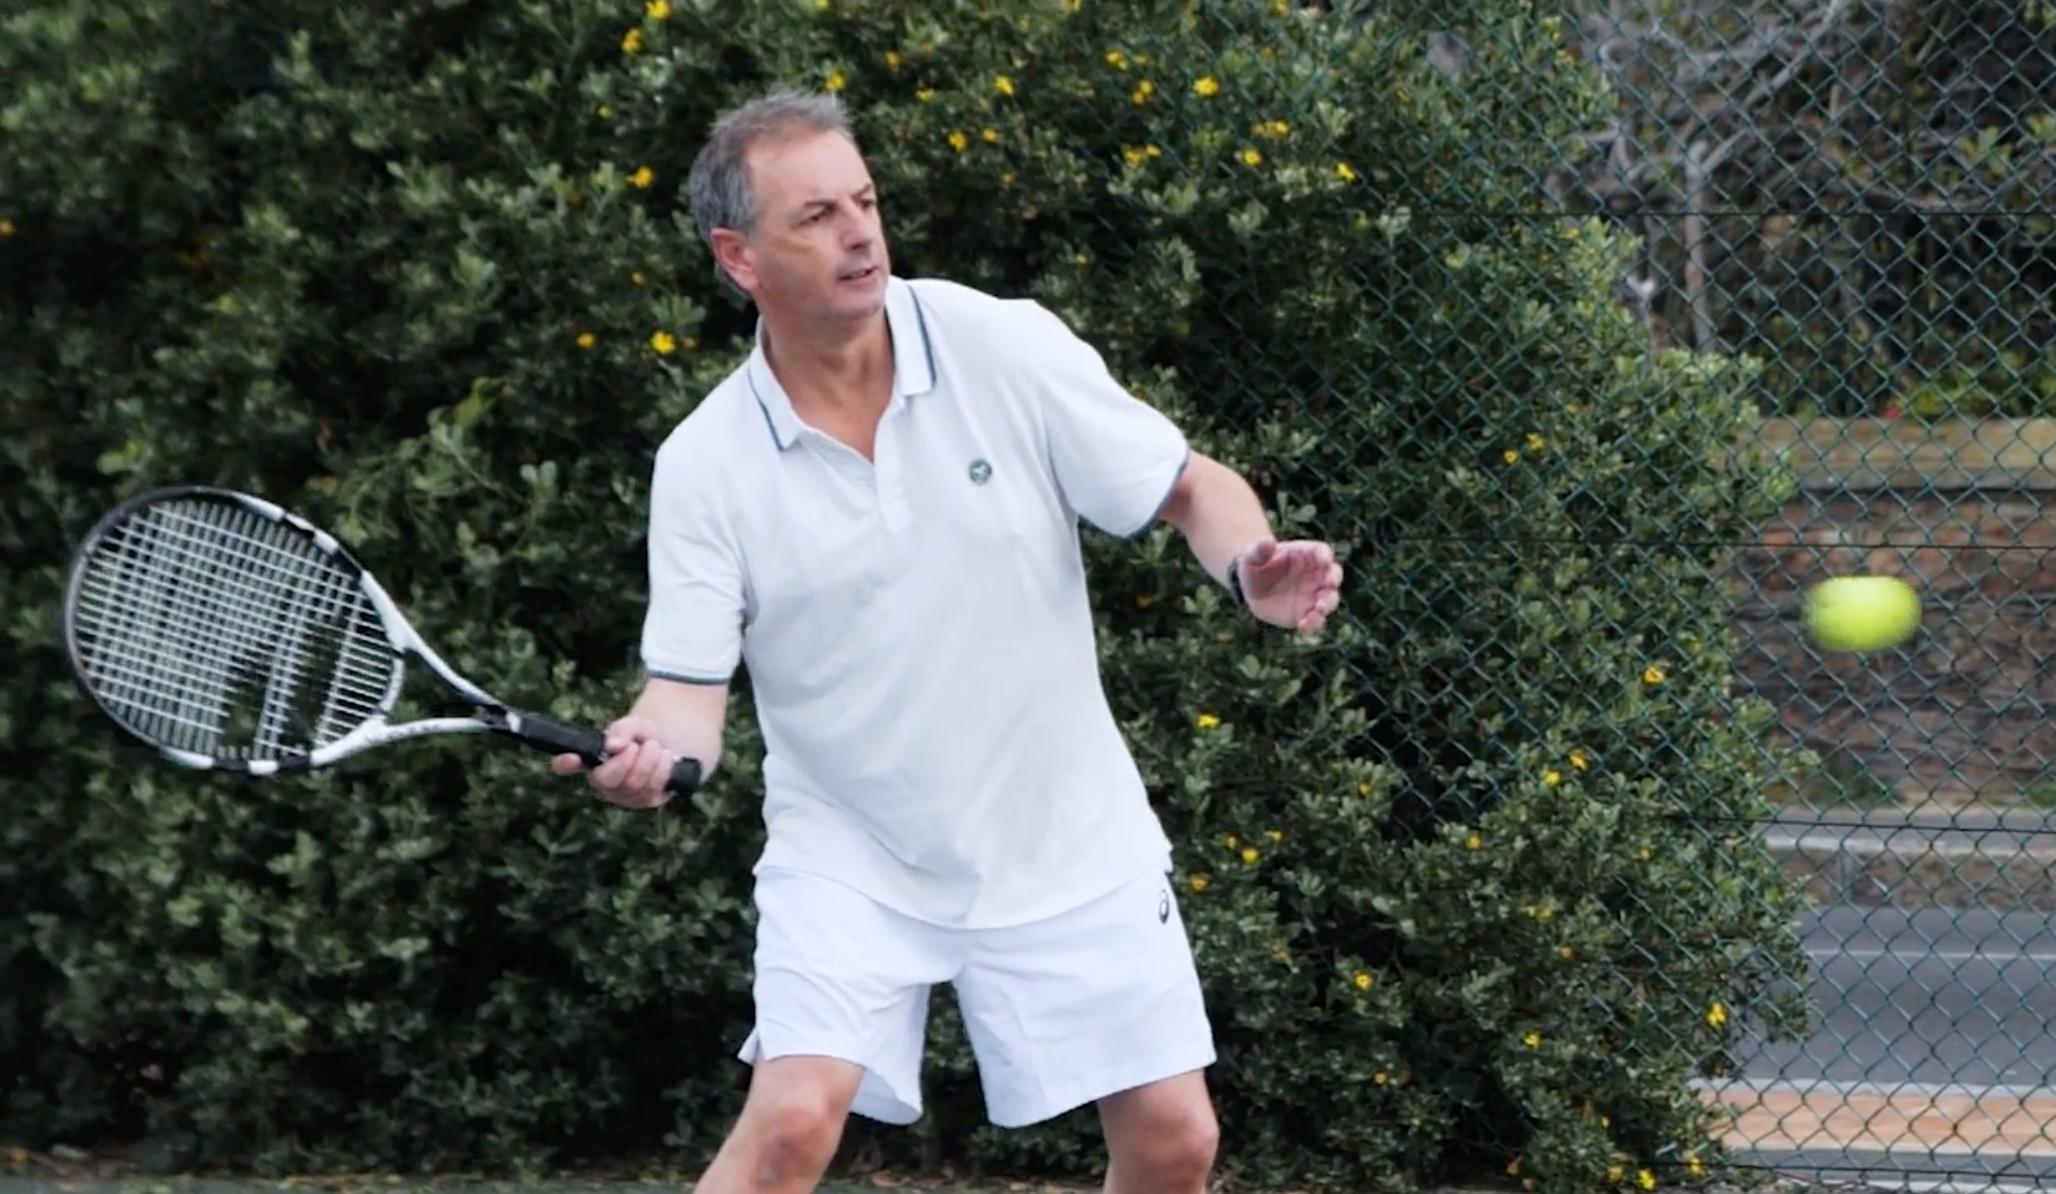 Jeremy Swartz playing tennis